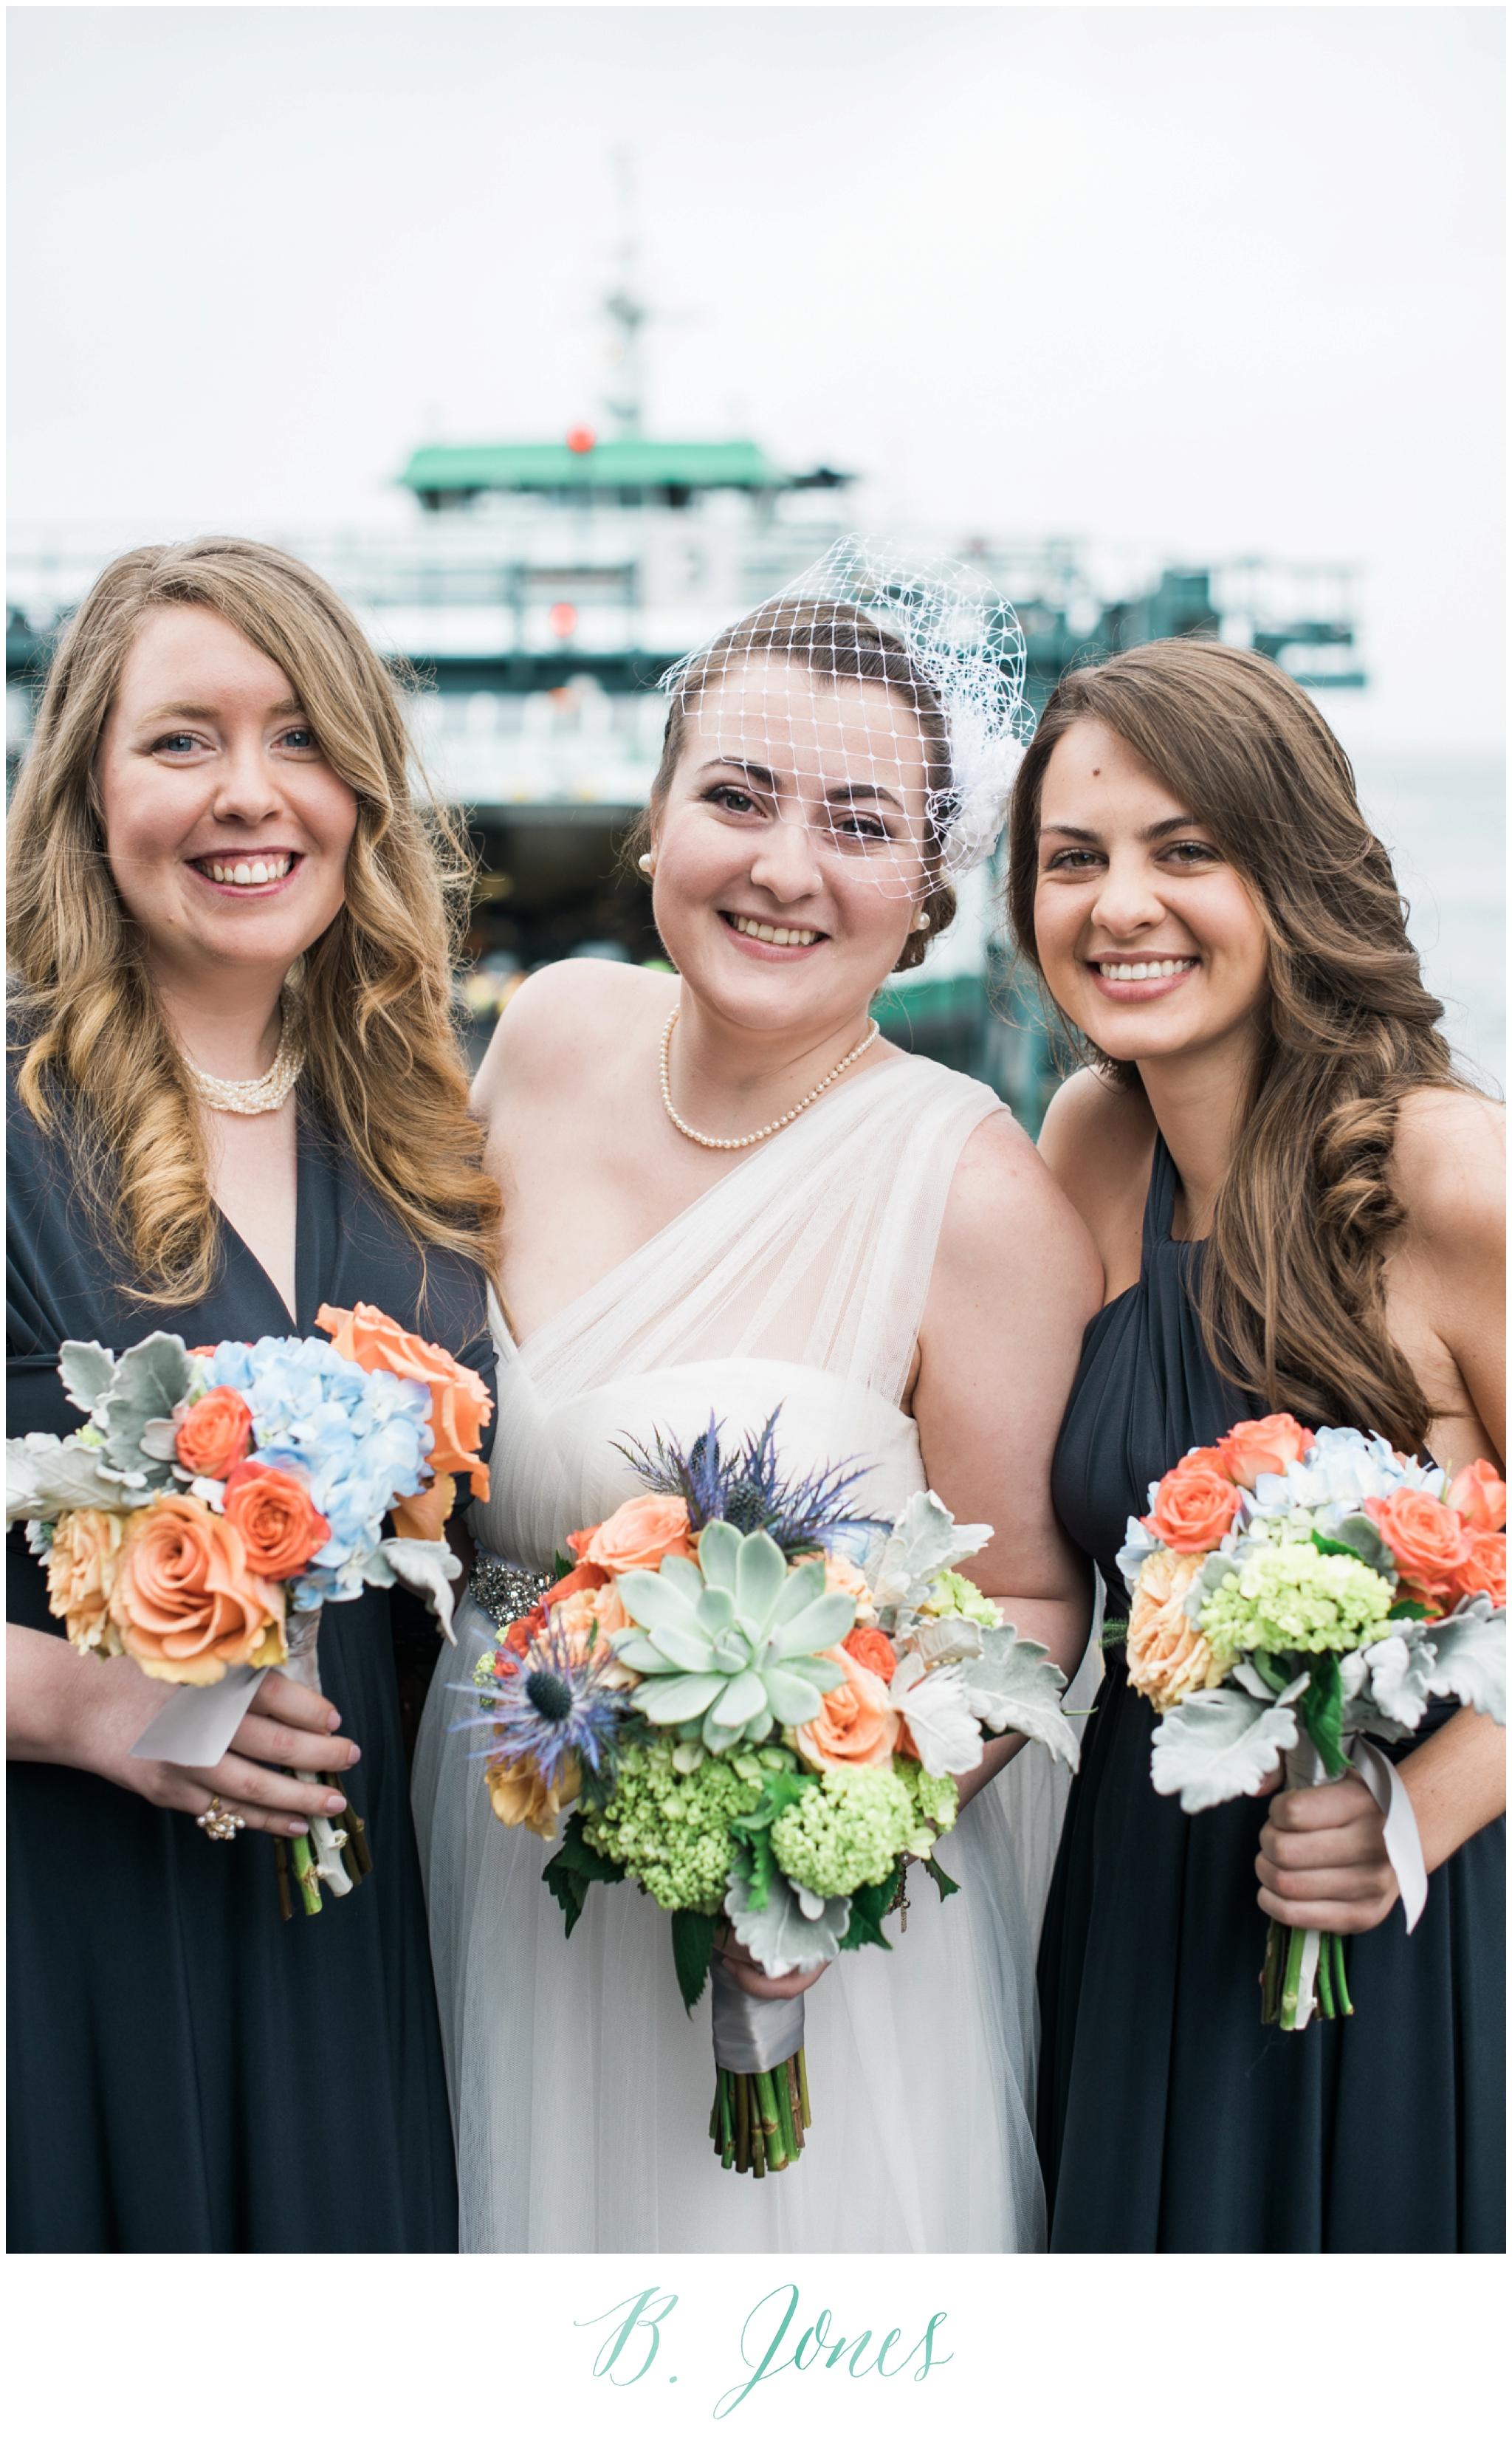 Seattle Ferry Wedding. Piccolino Reception. Seattle Wedding Photographer B. Jones Photography. World Spice Market. Pikes Place Market. Vintage Rolls Royce